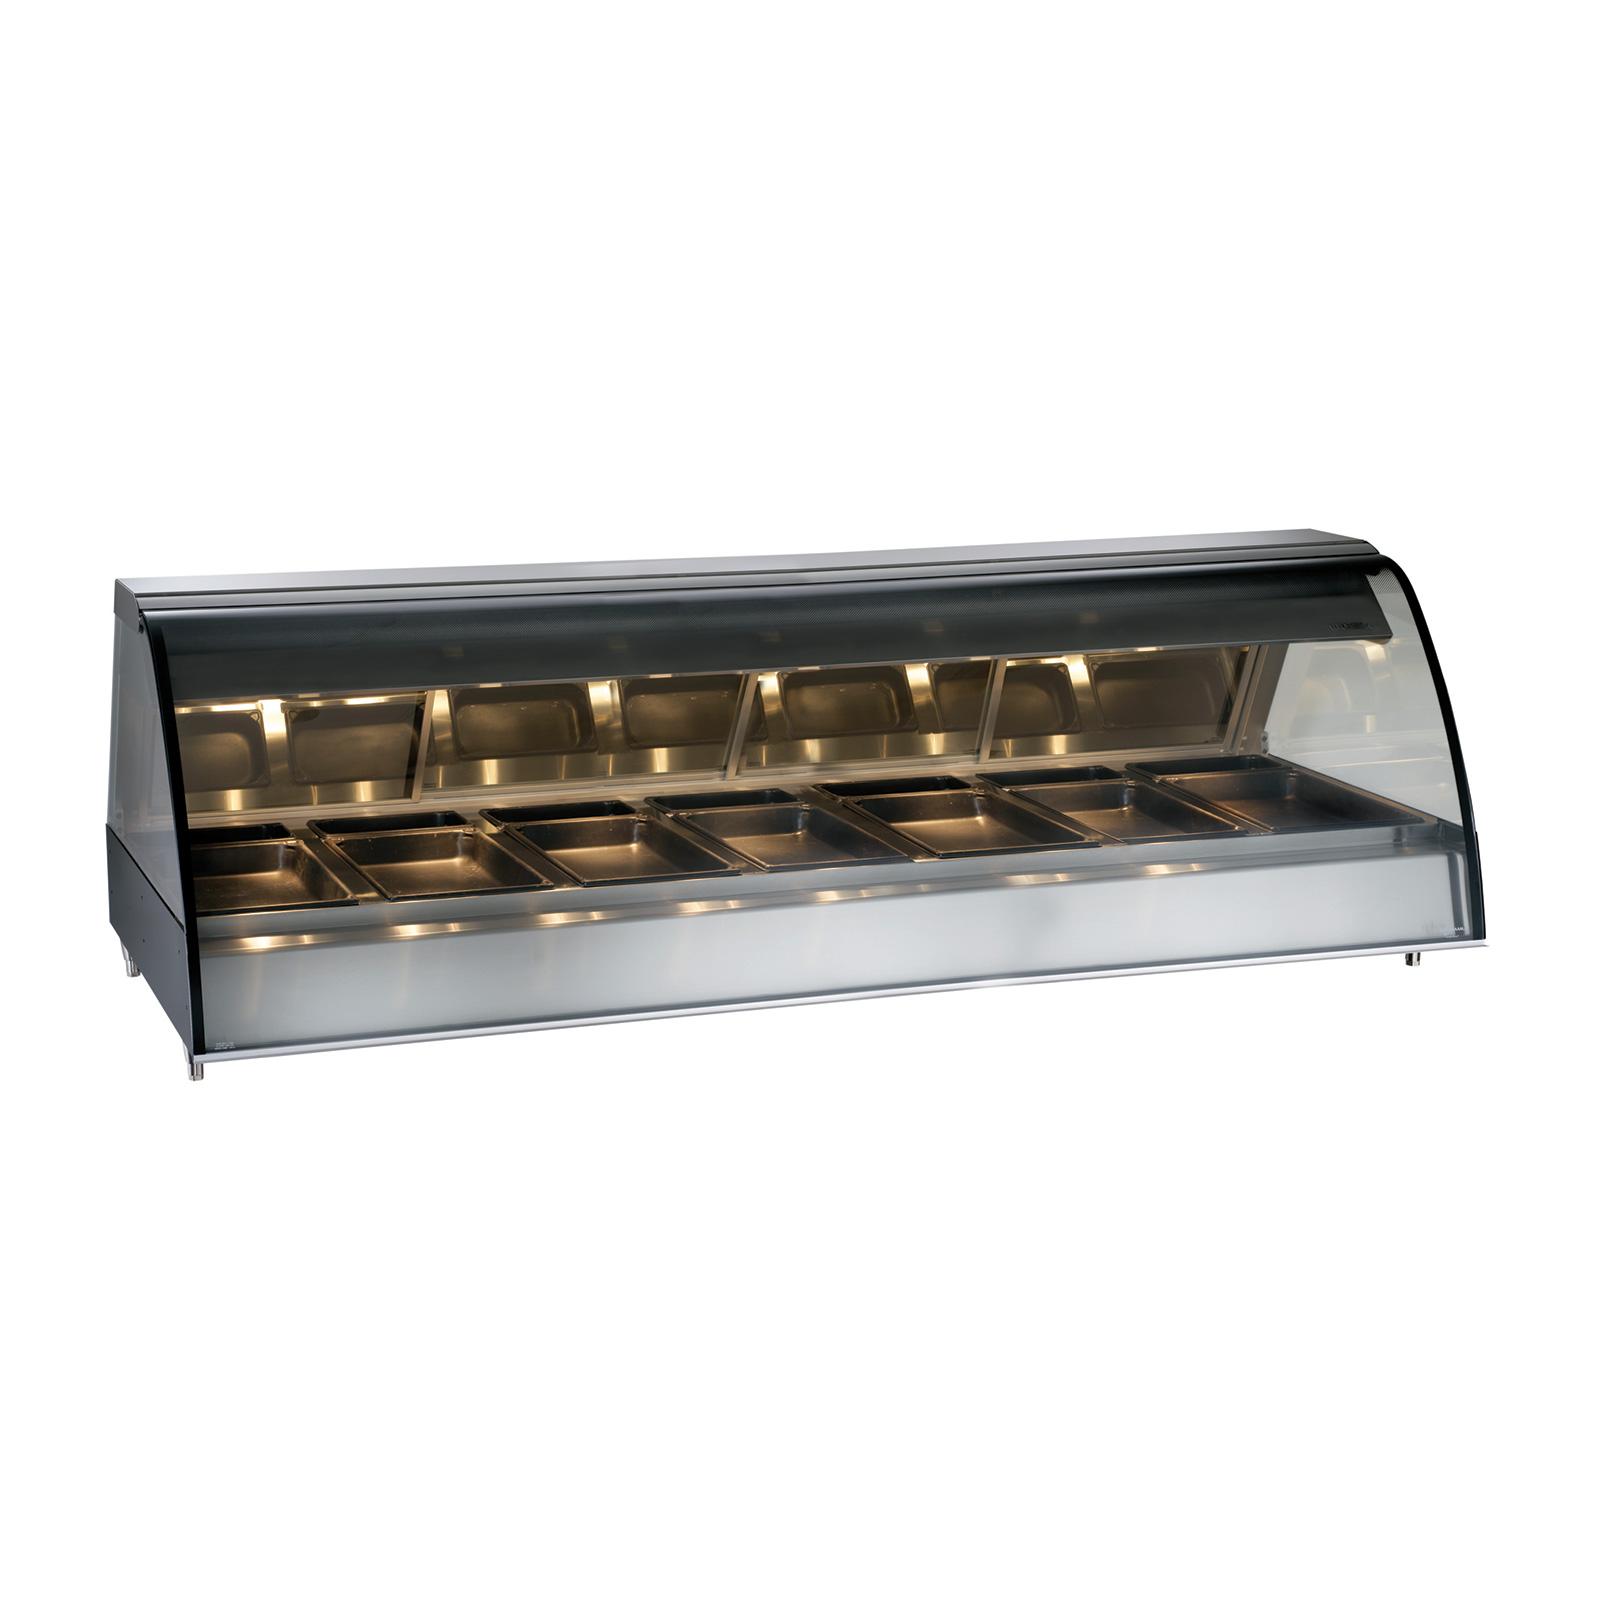 Alto-Shaam TY2-96-SS display case, heated deli, countertop